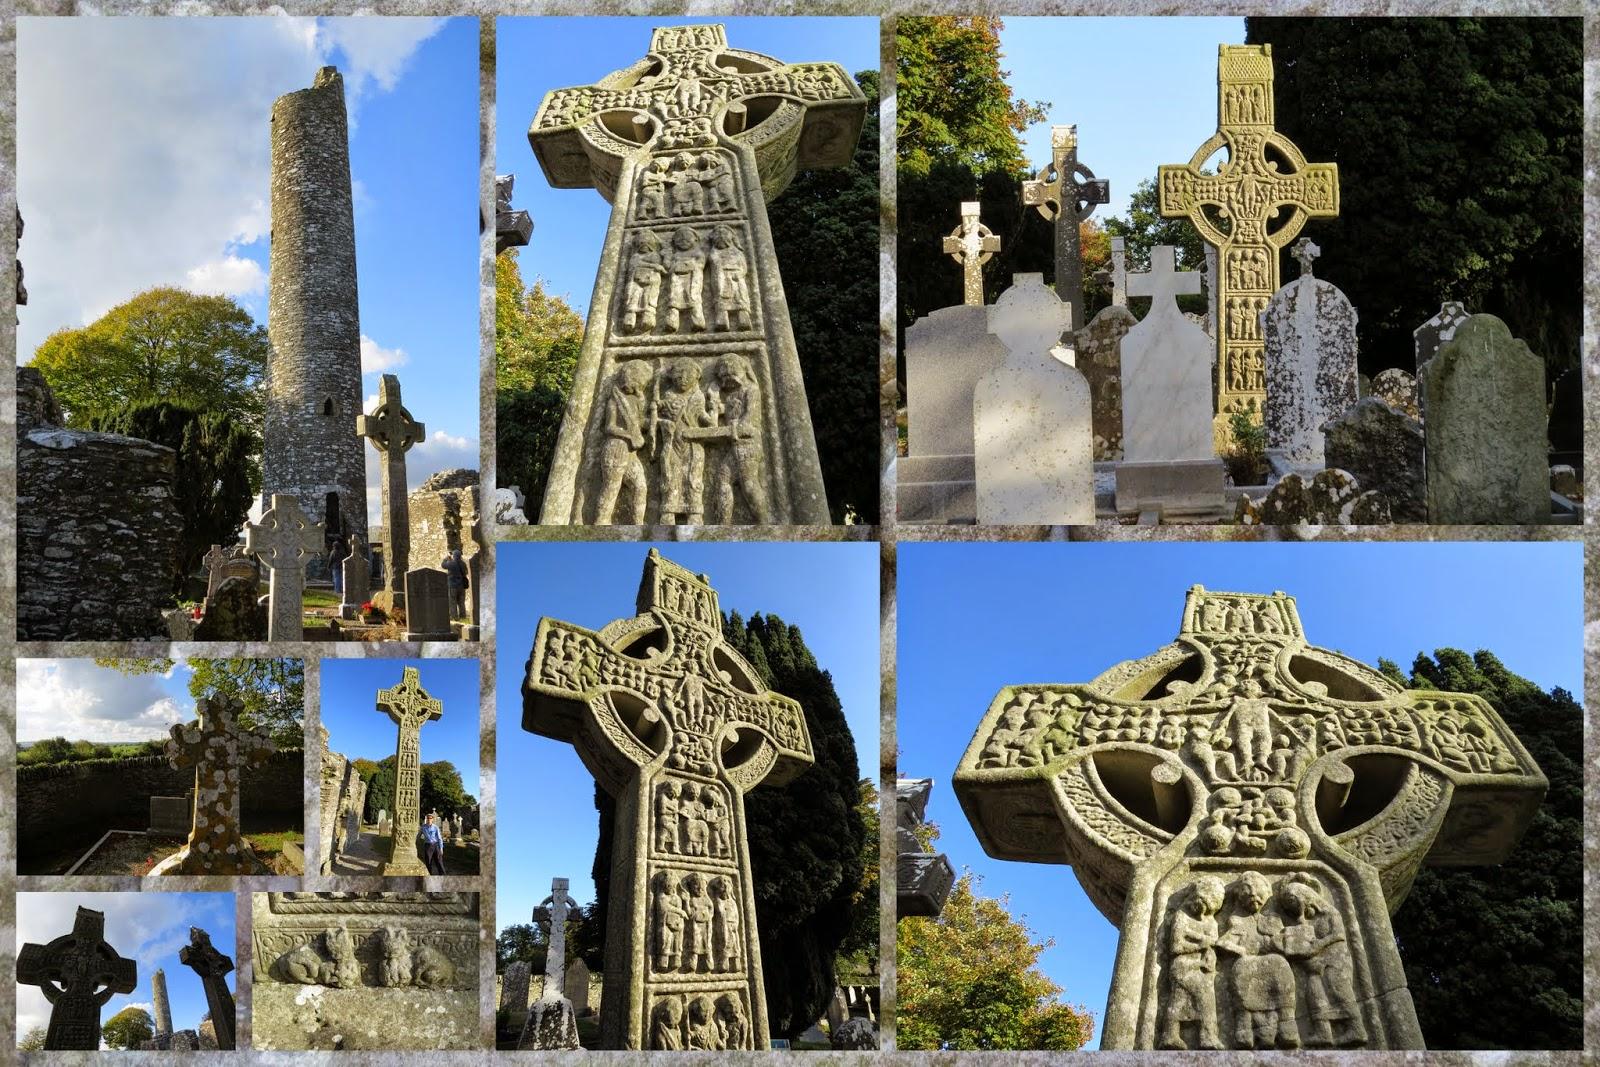 Ireland - Monasterboice Cemetery